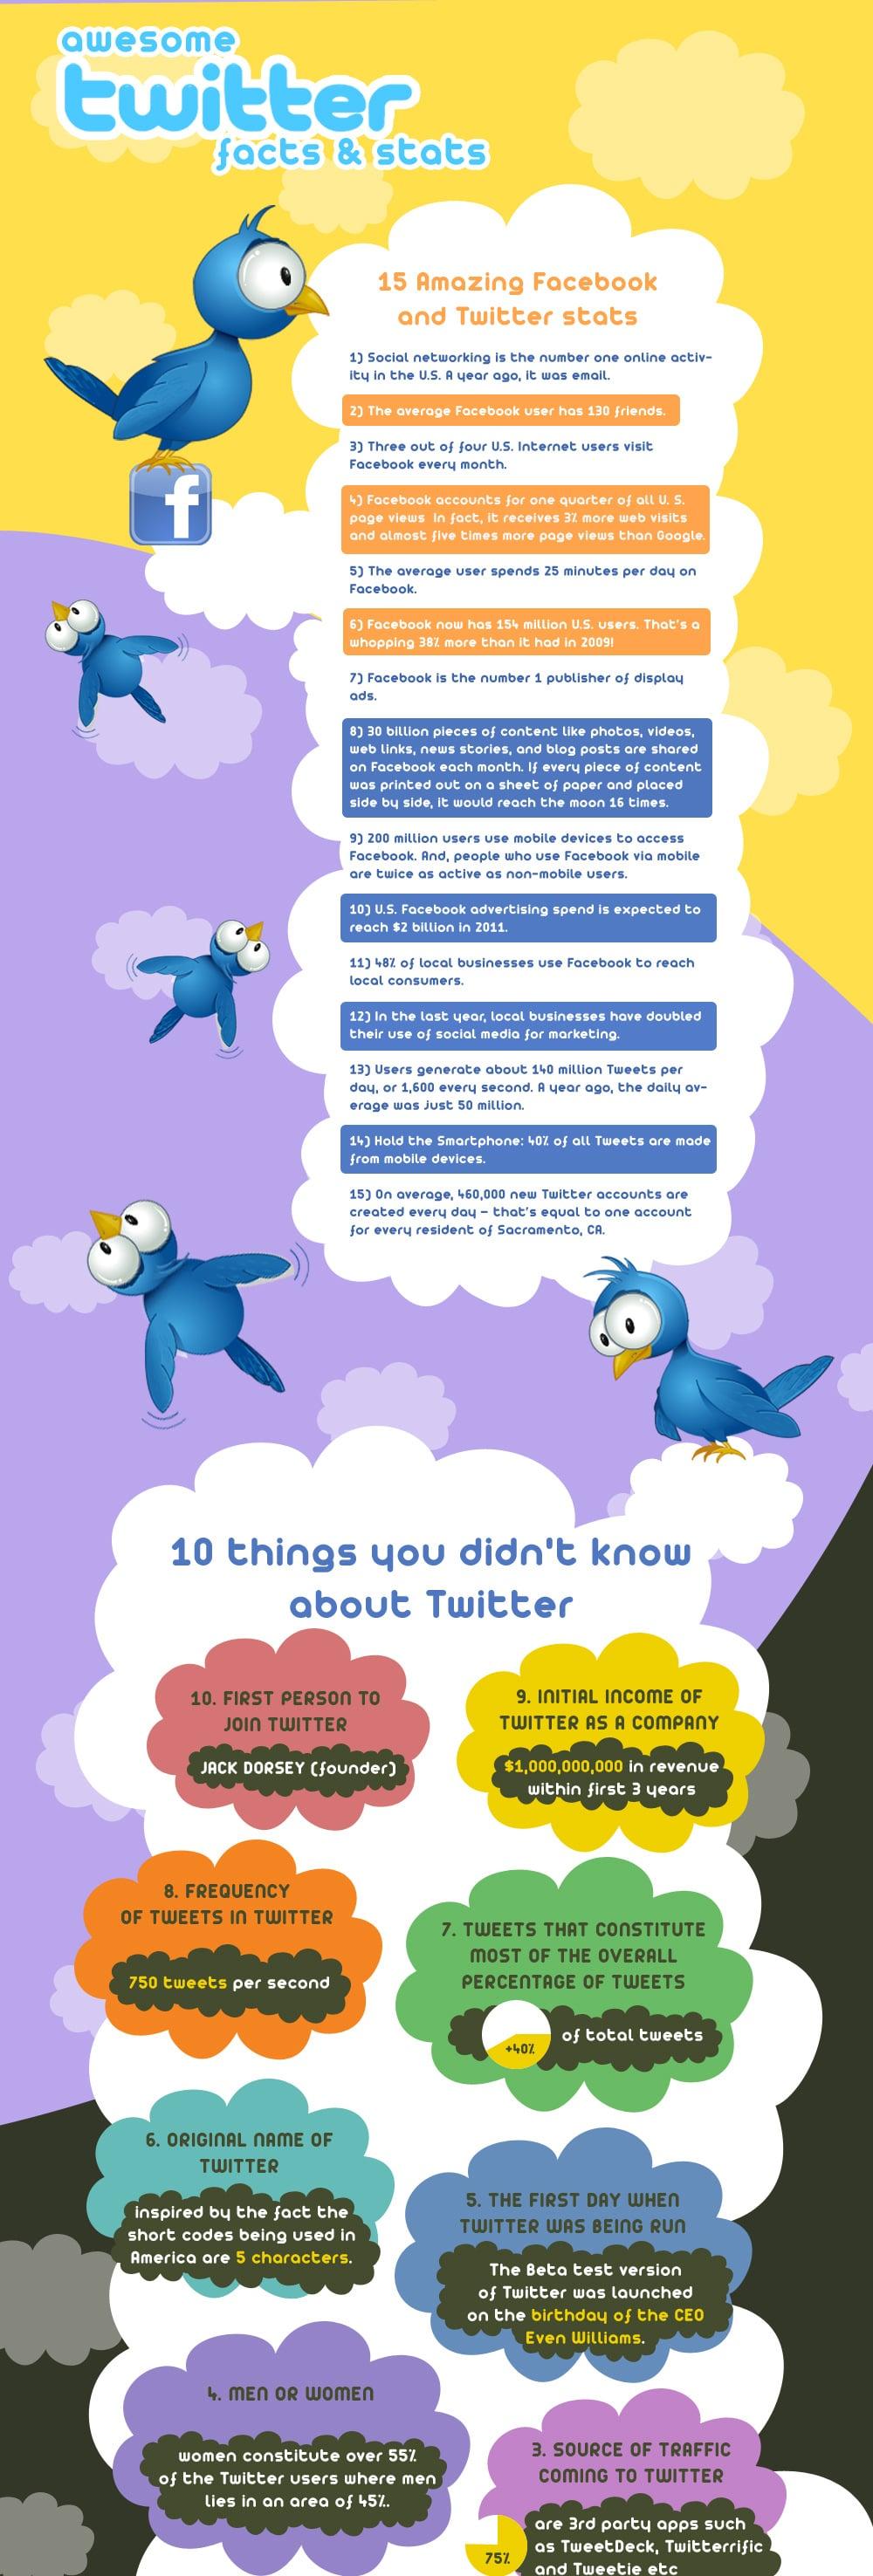 42 Fresh Twitter Facebook Facts